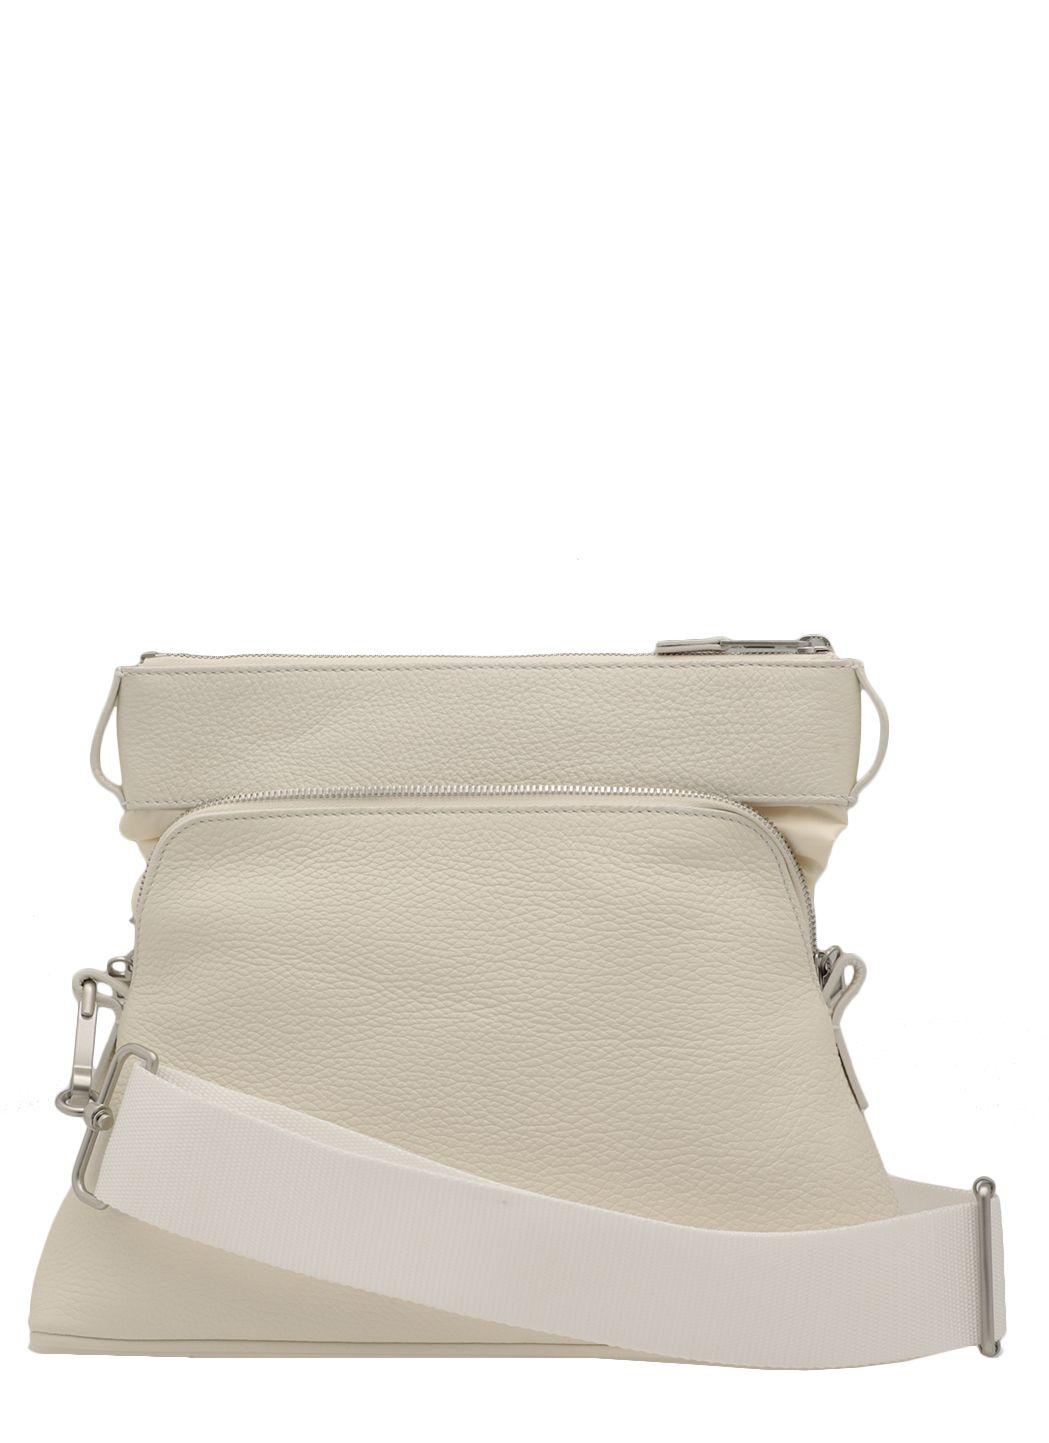 5AC Crossbody bag